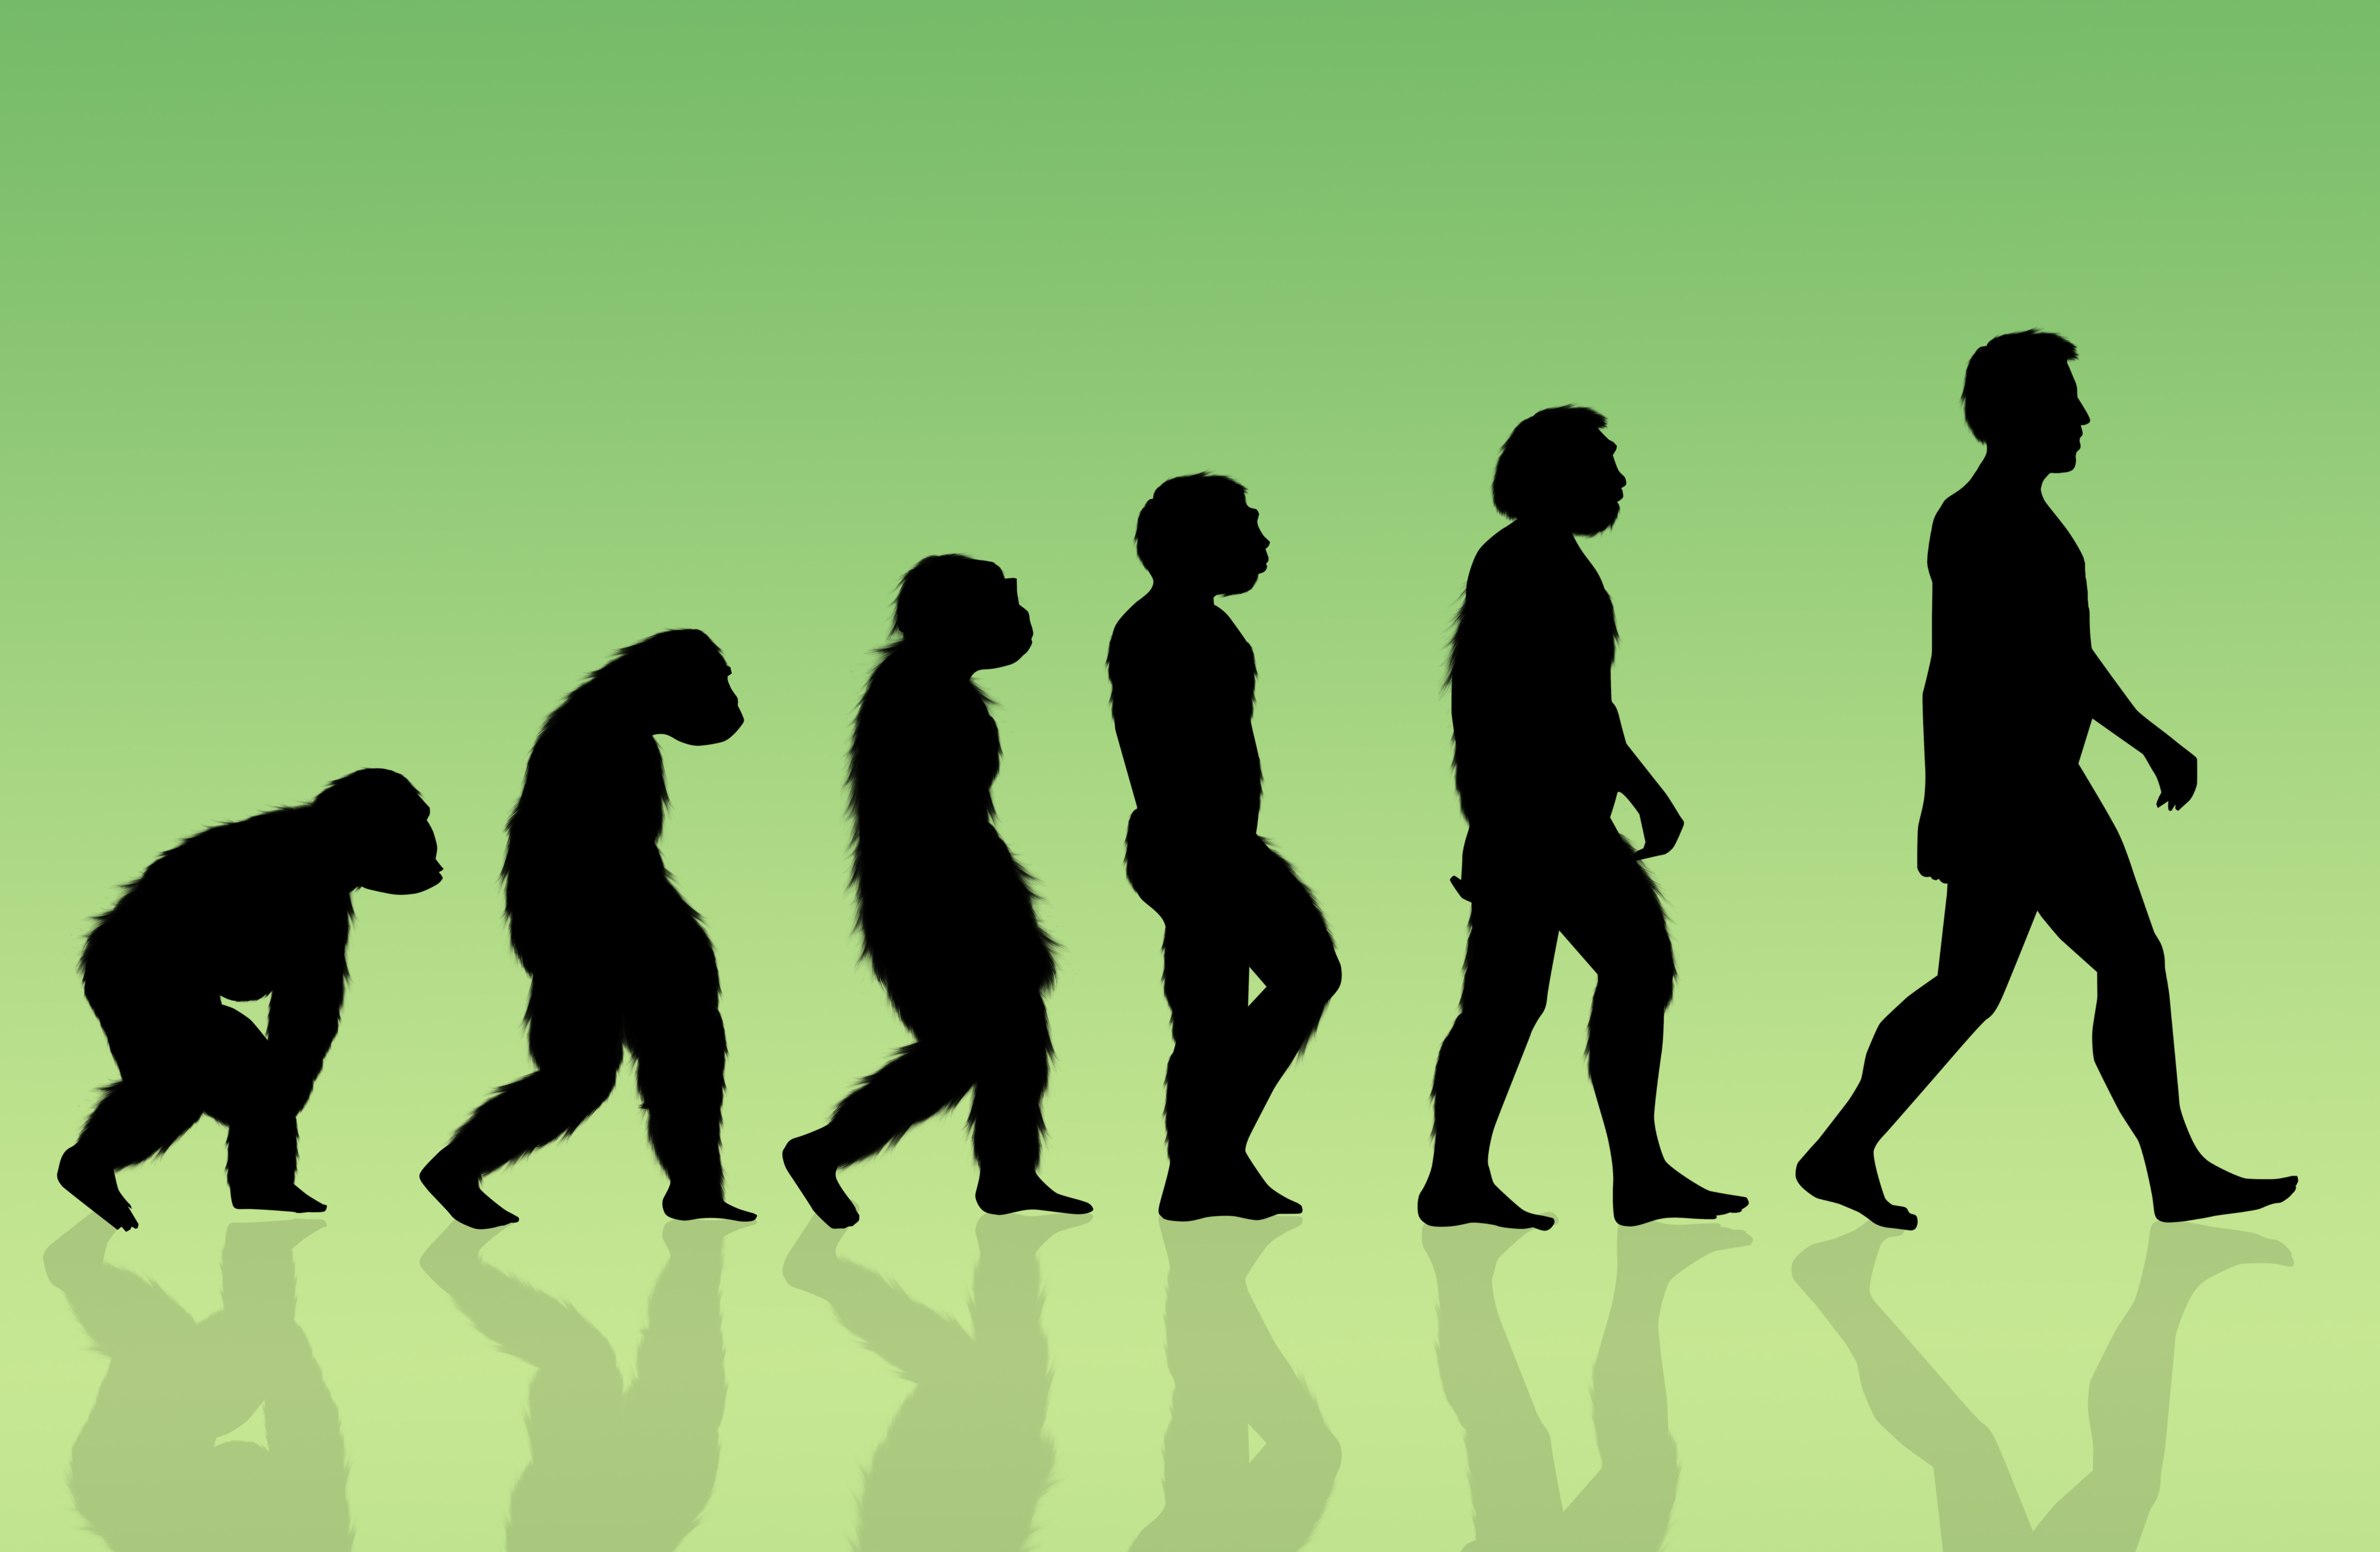 Эволюция человека от обезьяны картинка